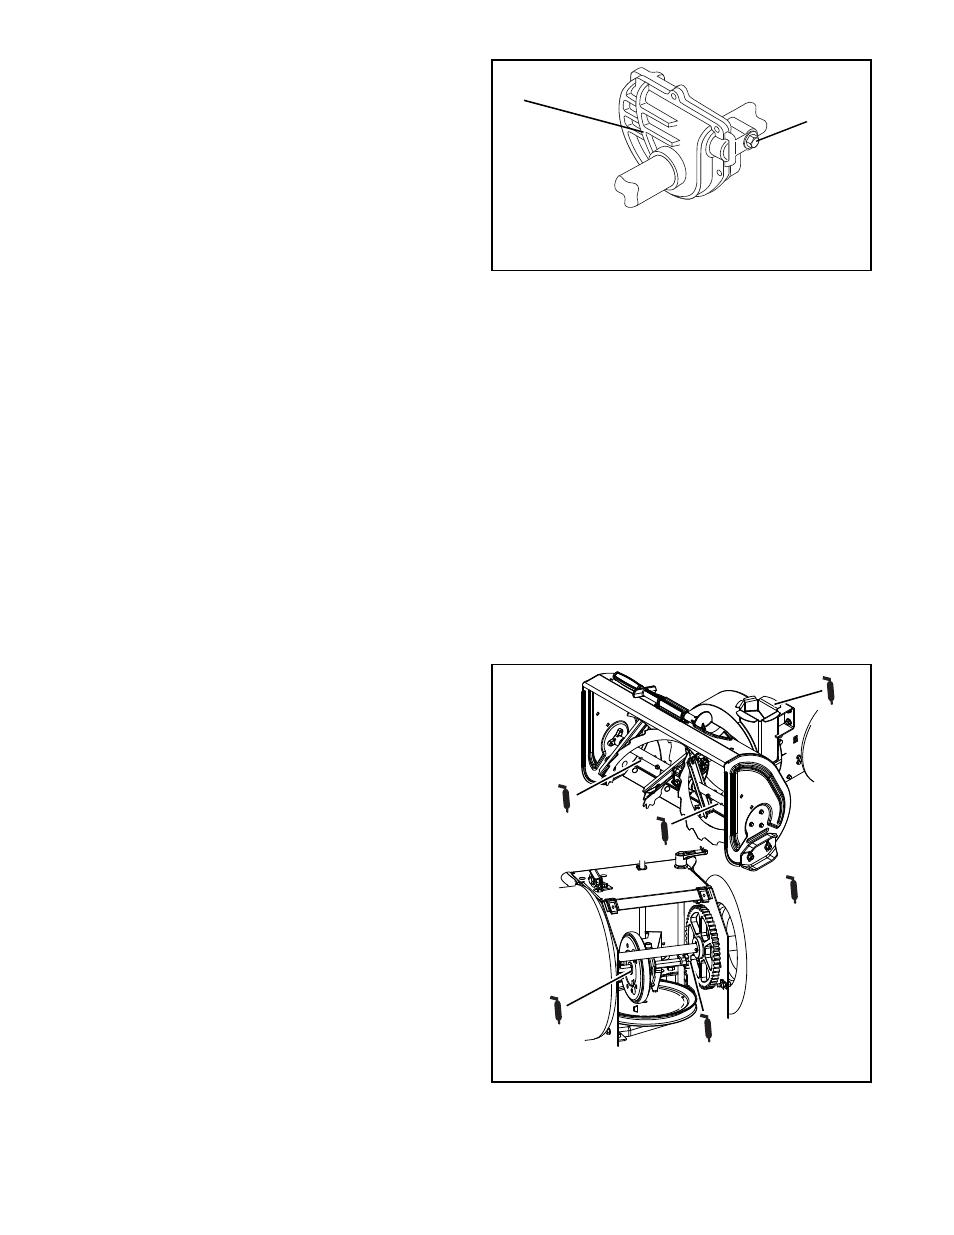 hight resolution of jacks small engines array ariens sno thro 920001 st624e user manual page 15 26 rh manualsdir